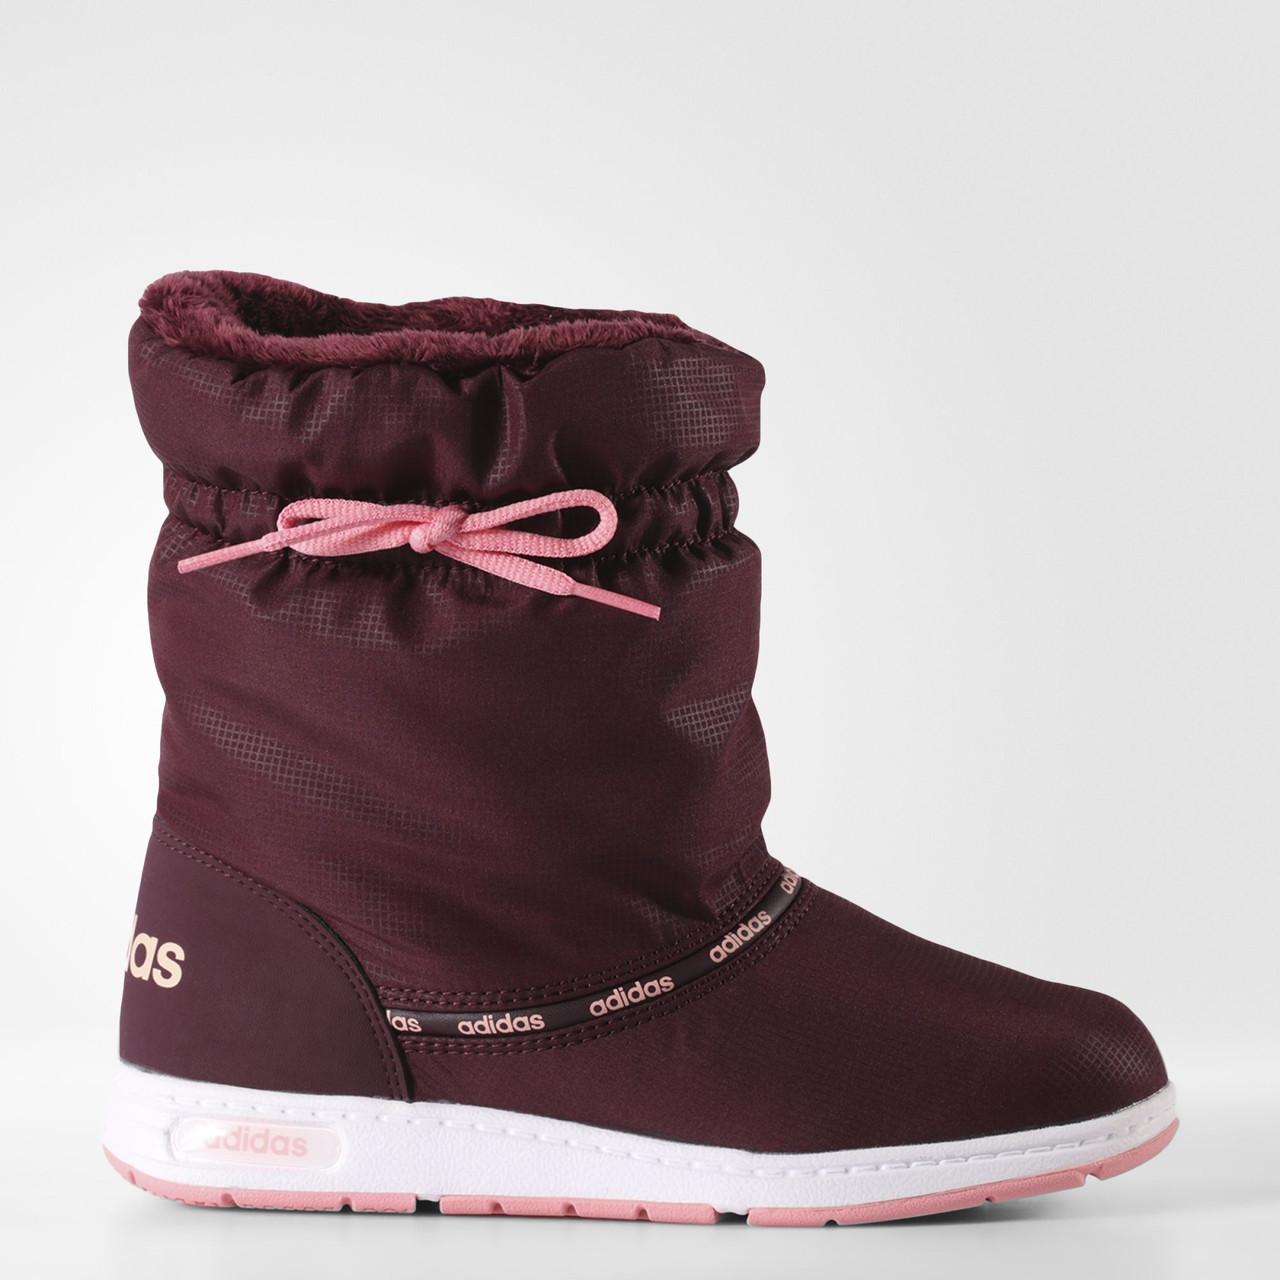 b9c95340 Женские сапоги Adidas Neo Warm Comfort (Артикул: AW4289) - Интернет-магазин  «